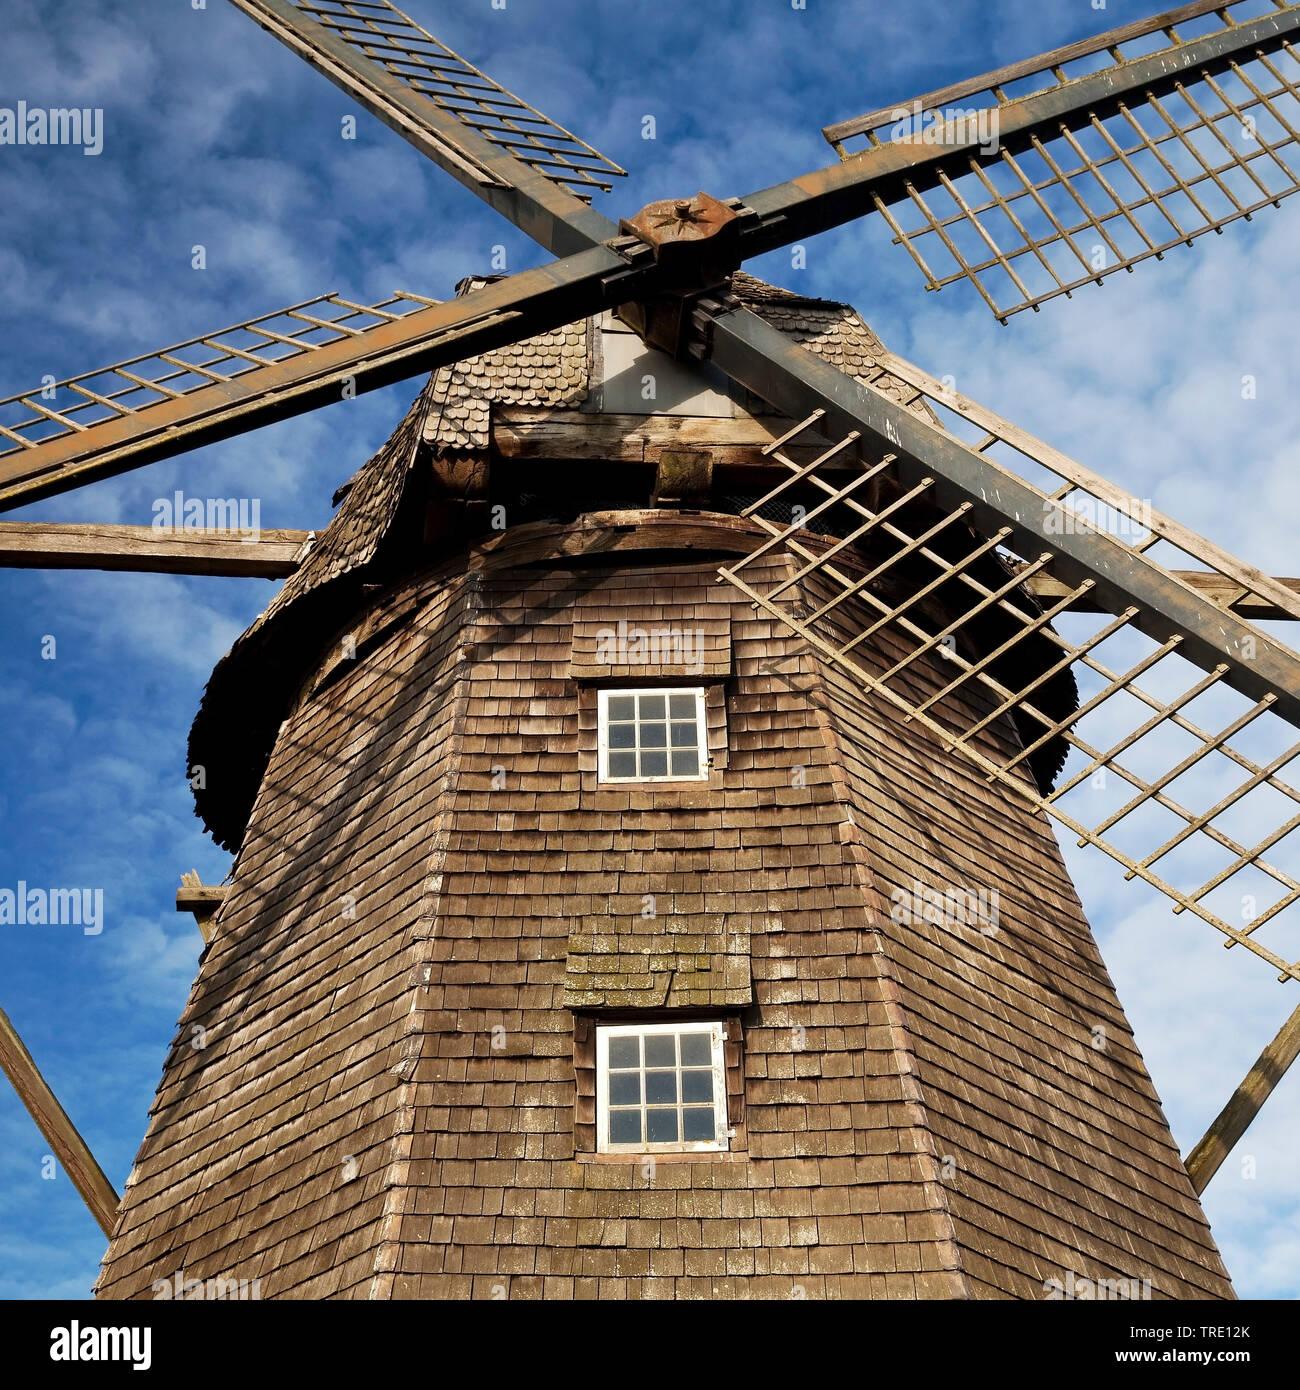 Letter Windmuehle, Deutschland, Nordrhein-Westfalen, Muensterland, Coesfeld   windmill in Coesfeld-Lette, Germany, North Rhine-Westphalia, Muensterlan - Stock Image